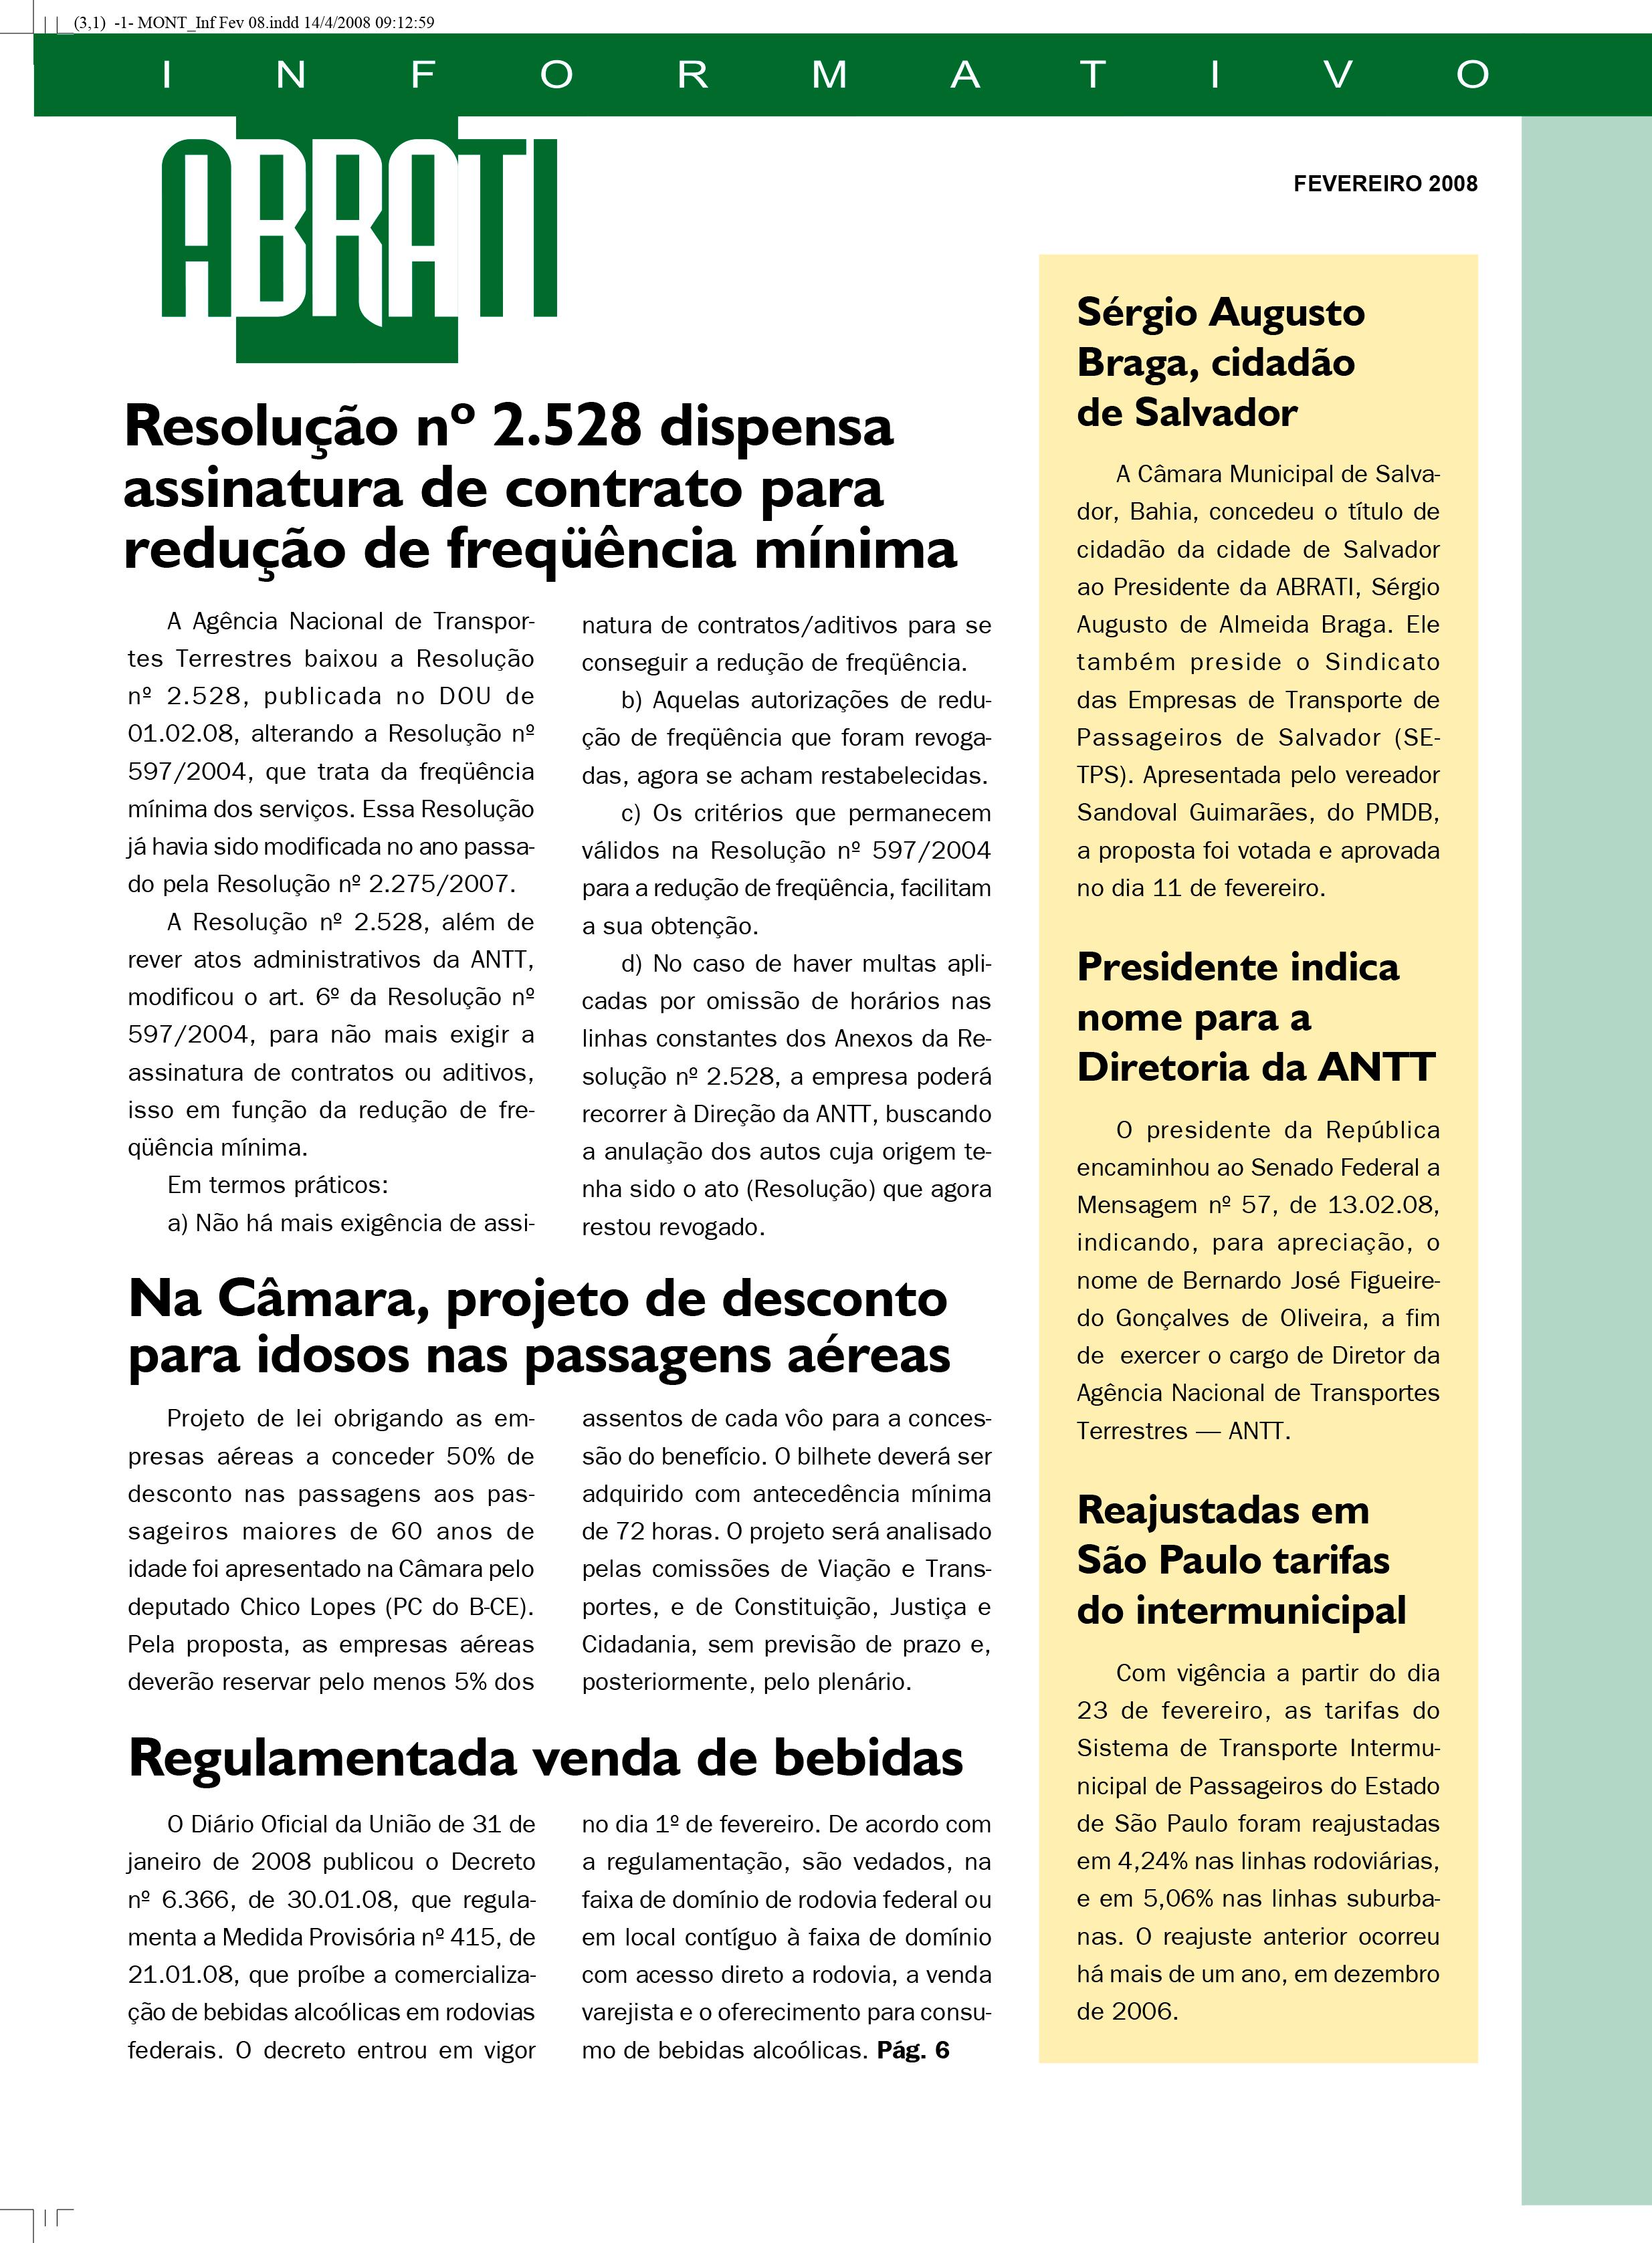 Informativo Fevereiro 2008